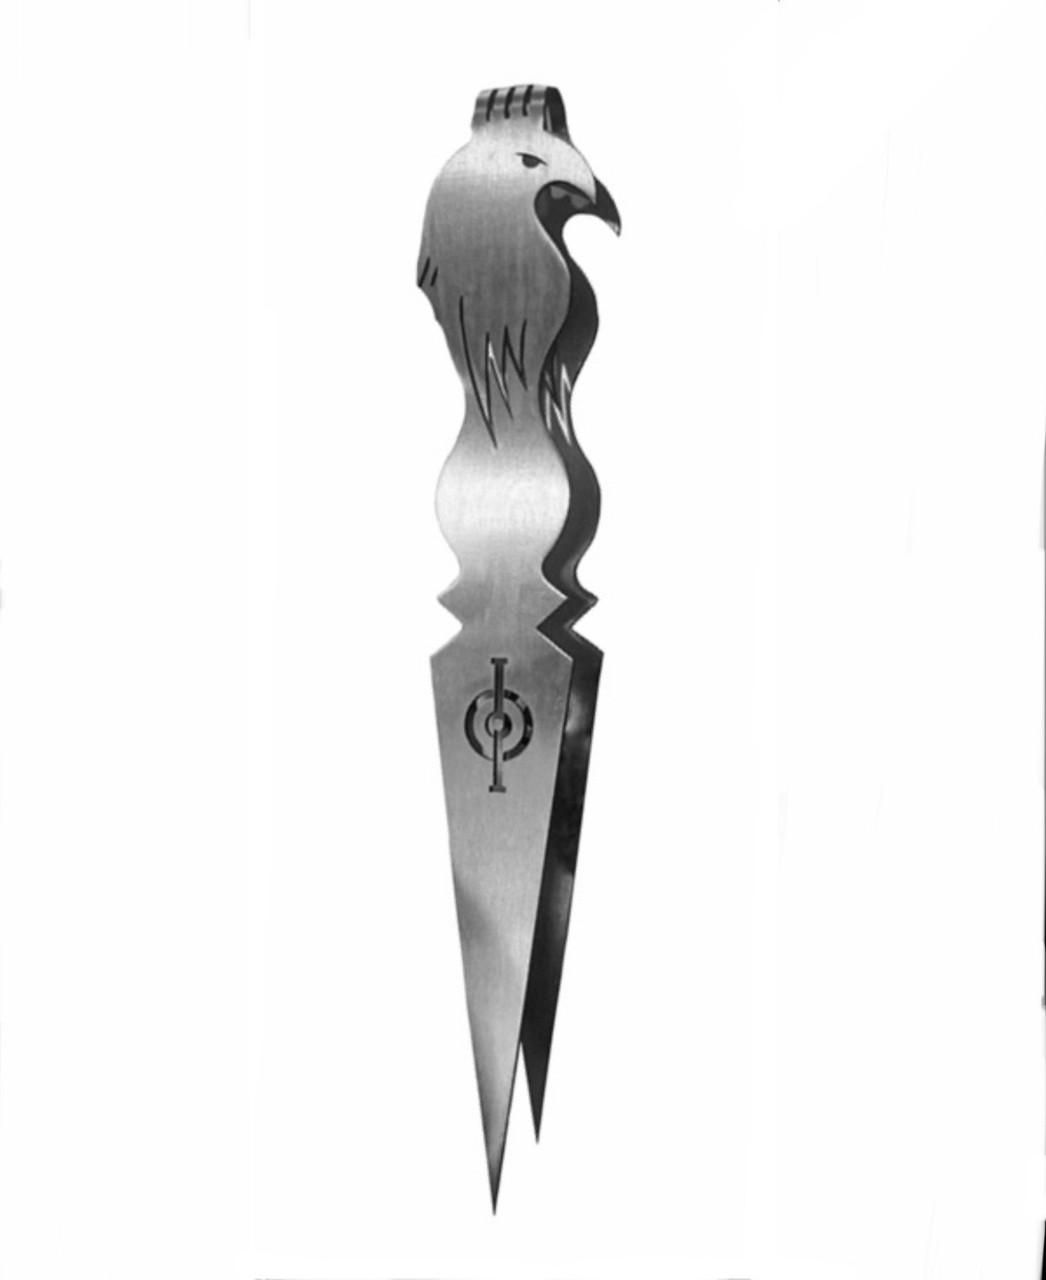 Щипцы для кальяна Orden - Merlin  (Орден Мерлина)